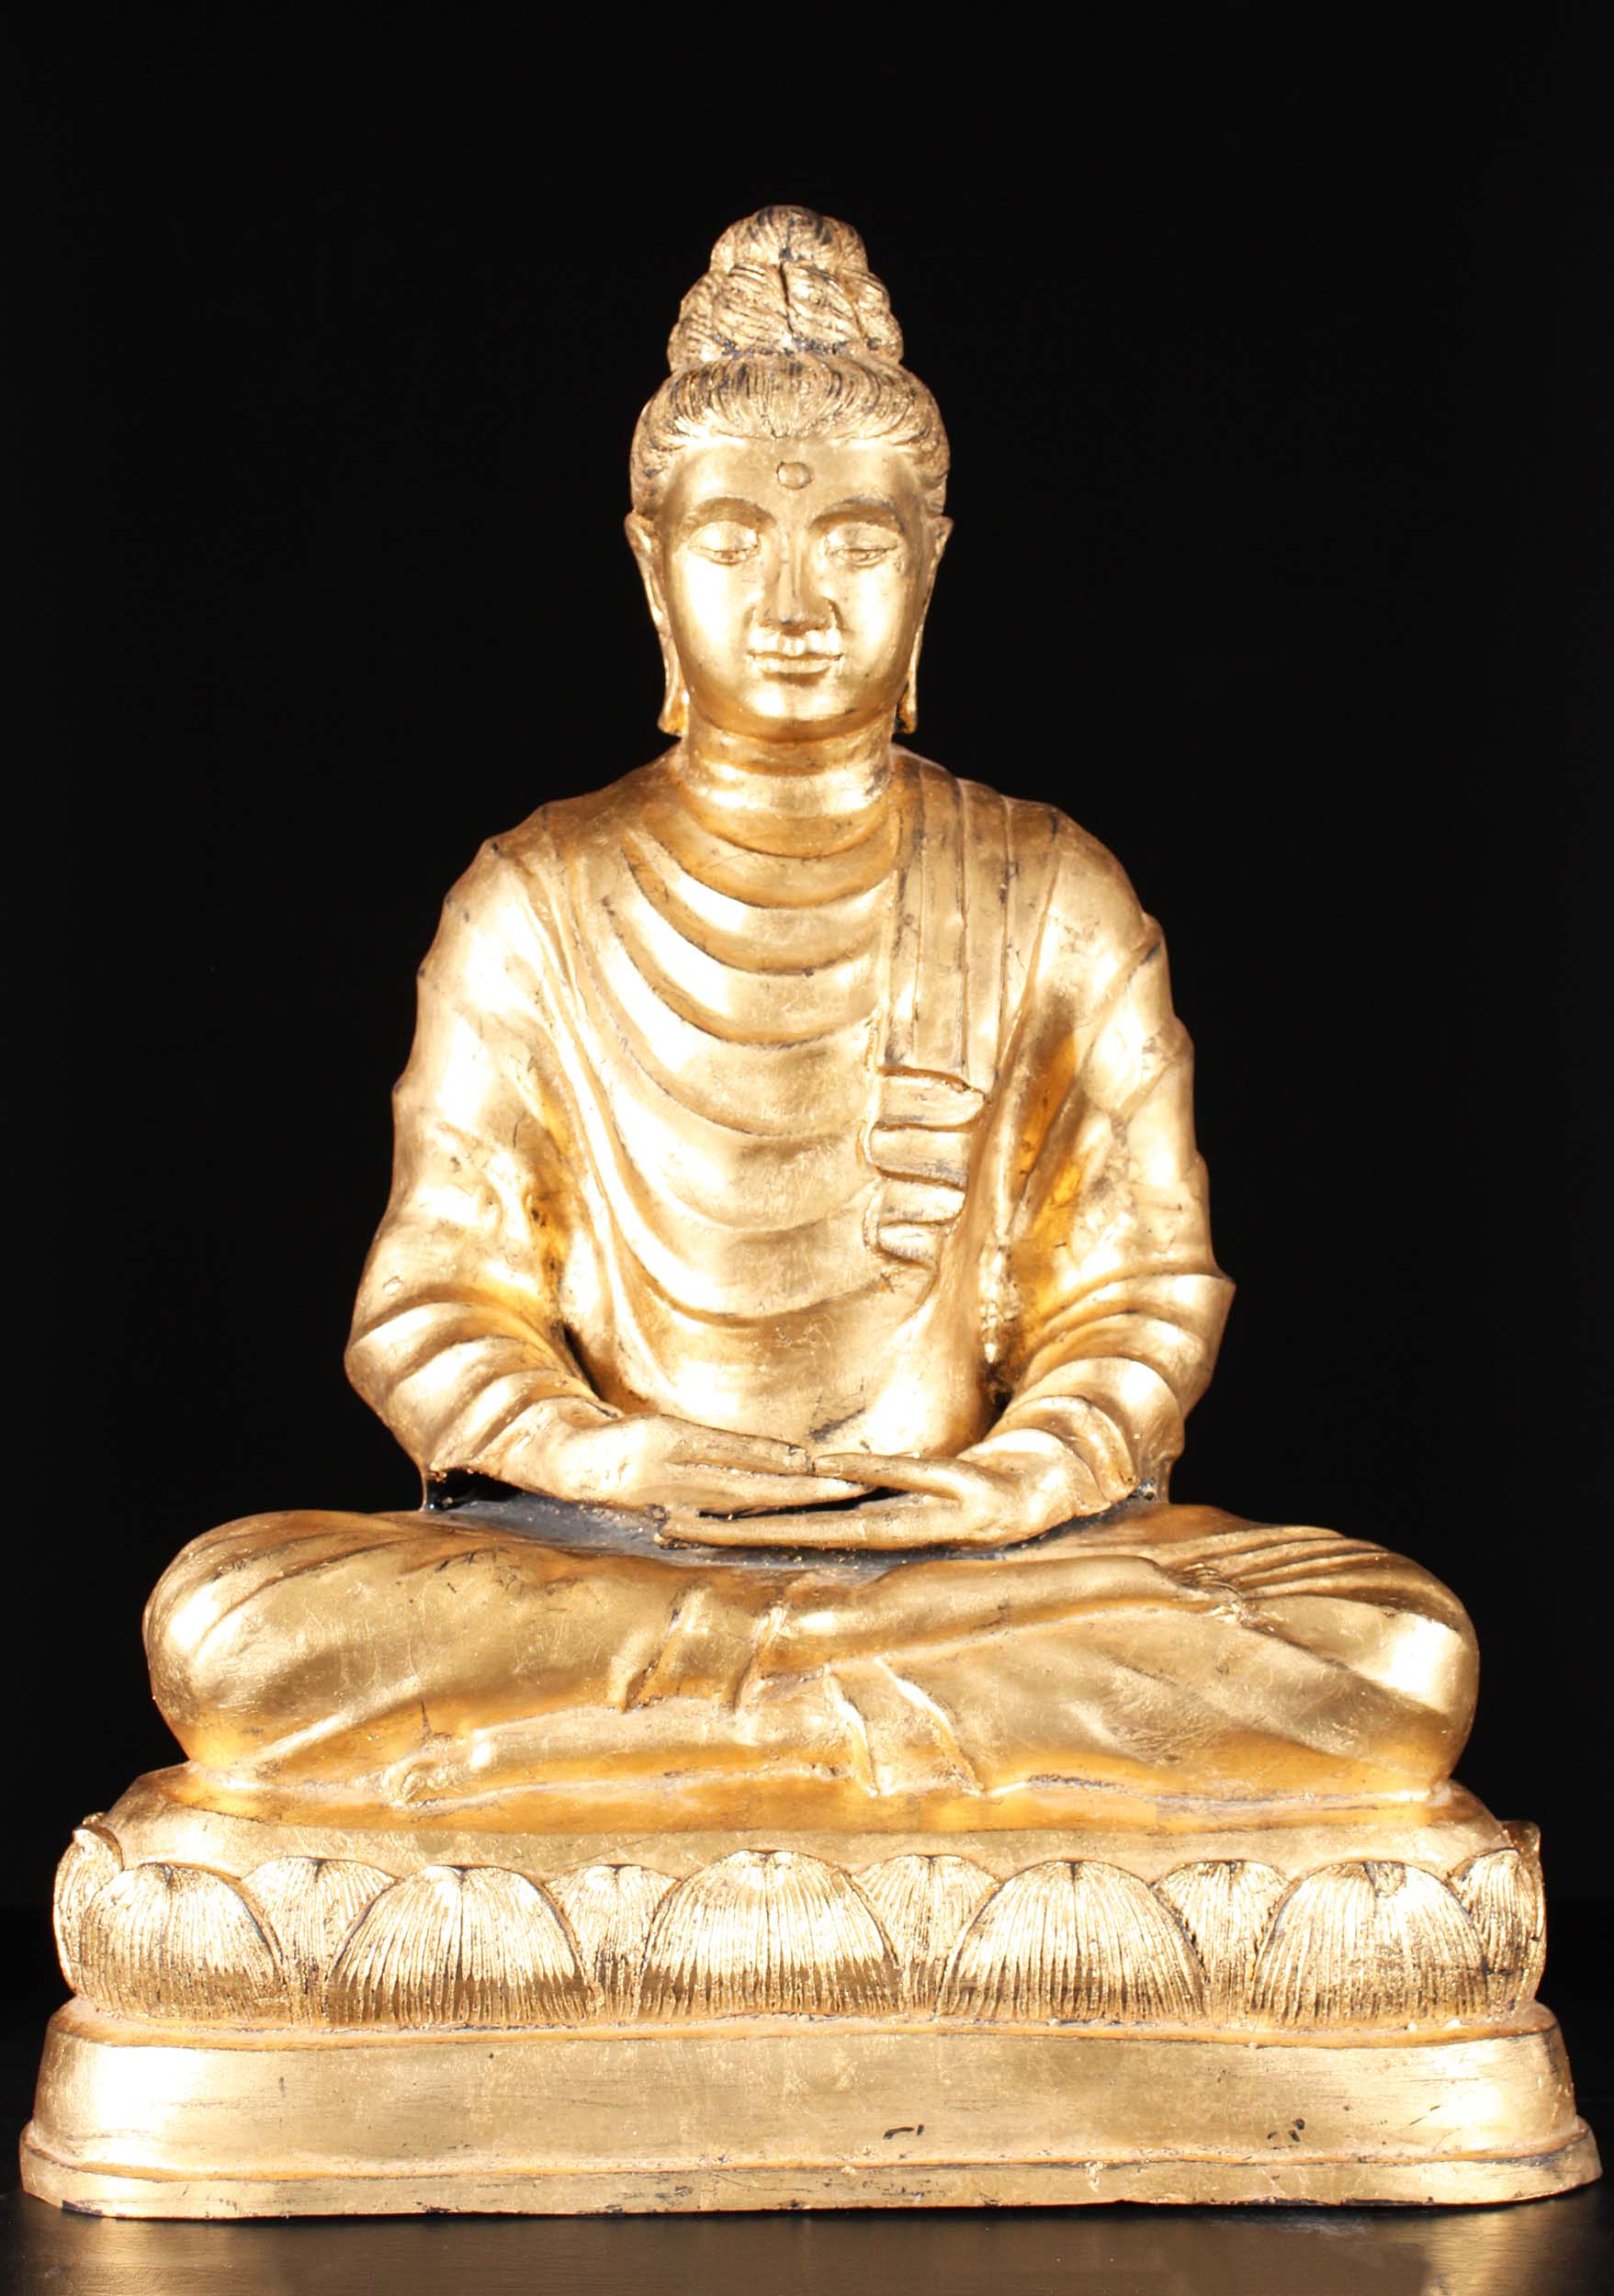 Brass Gandhara Gold Leaf Buddha Statue 26 58t1a Hindu Gods Buddha Statues